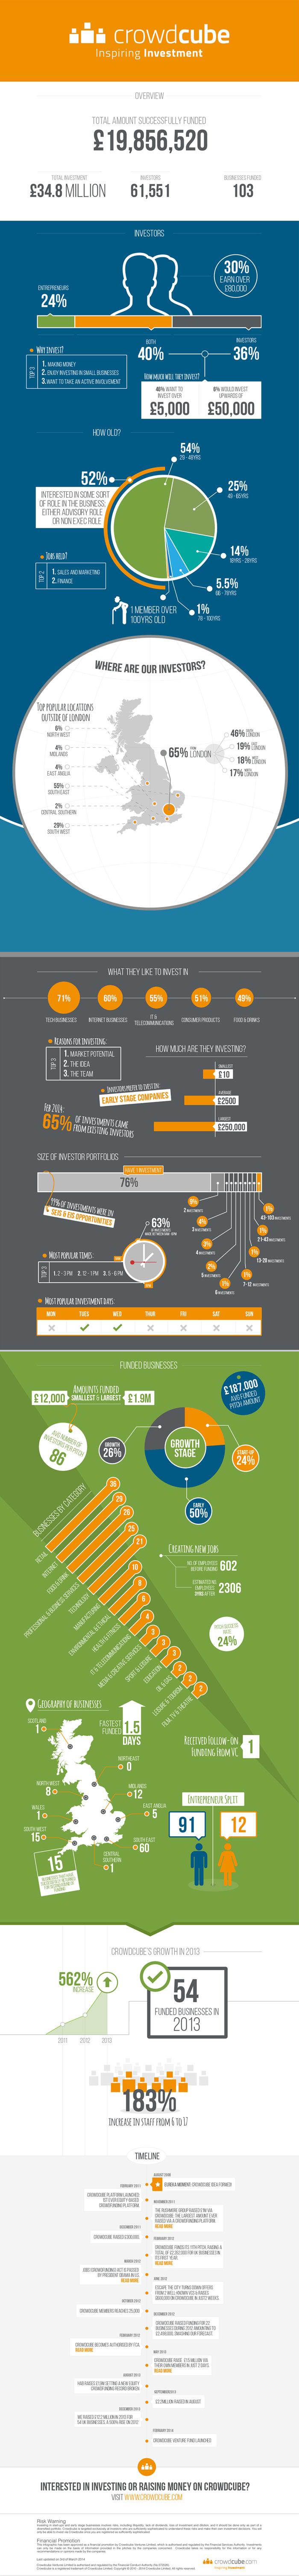 Crowdcube infographic 2014